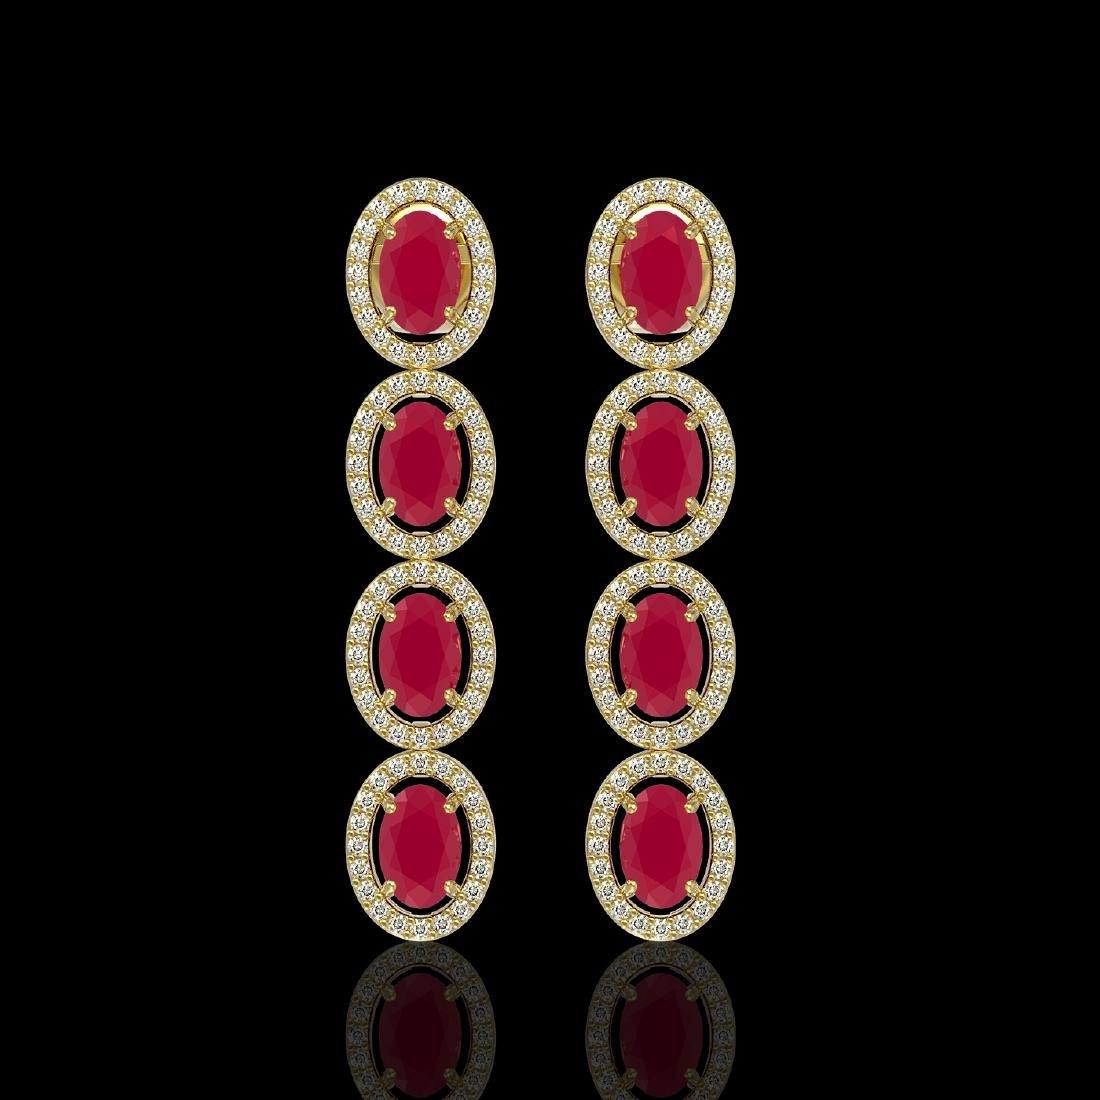 6.47 CTW Ruby & Diamond Halo Earrings 10K Yellow Gold